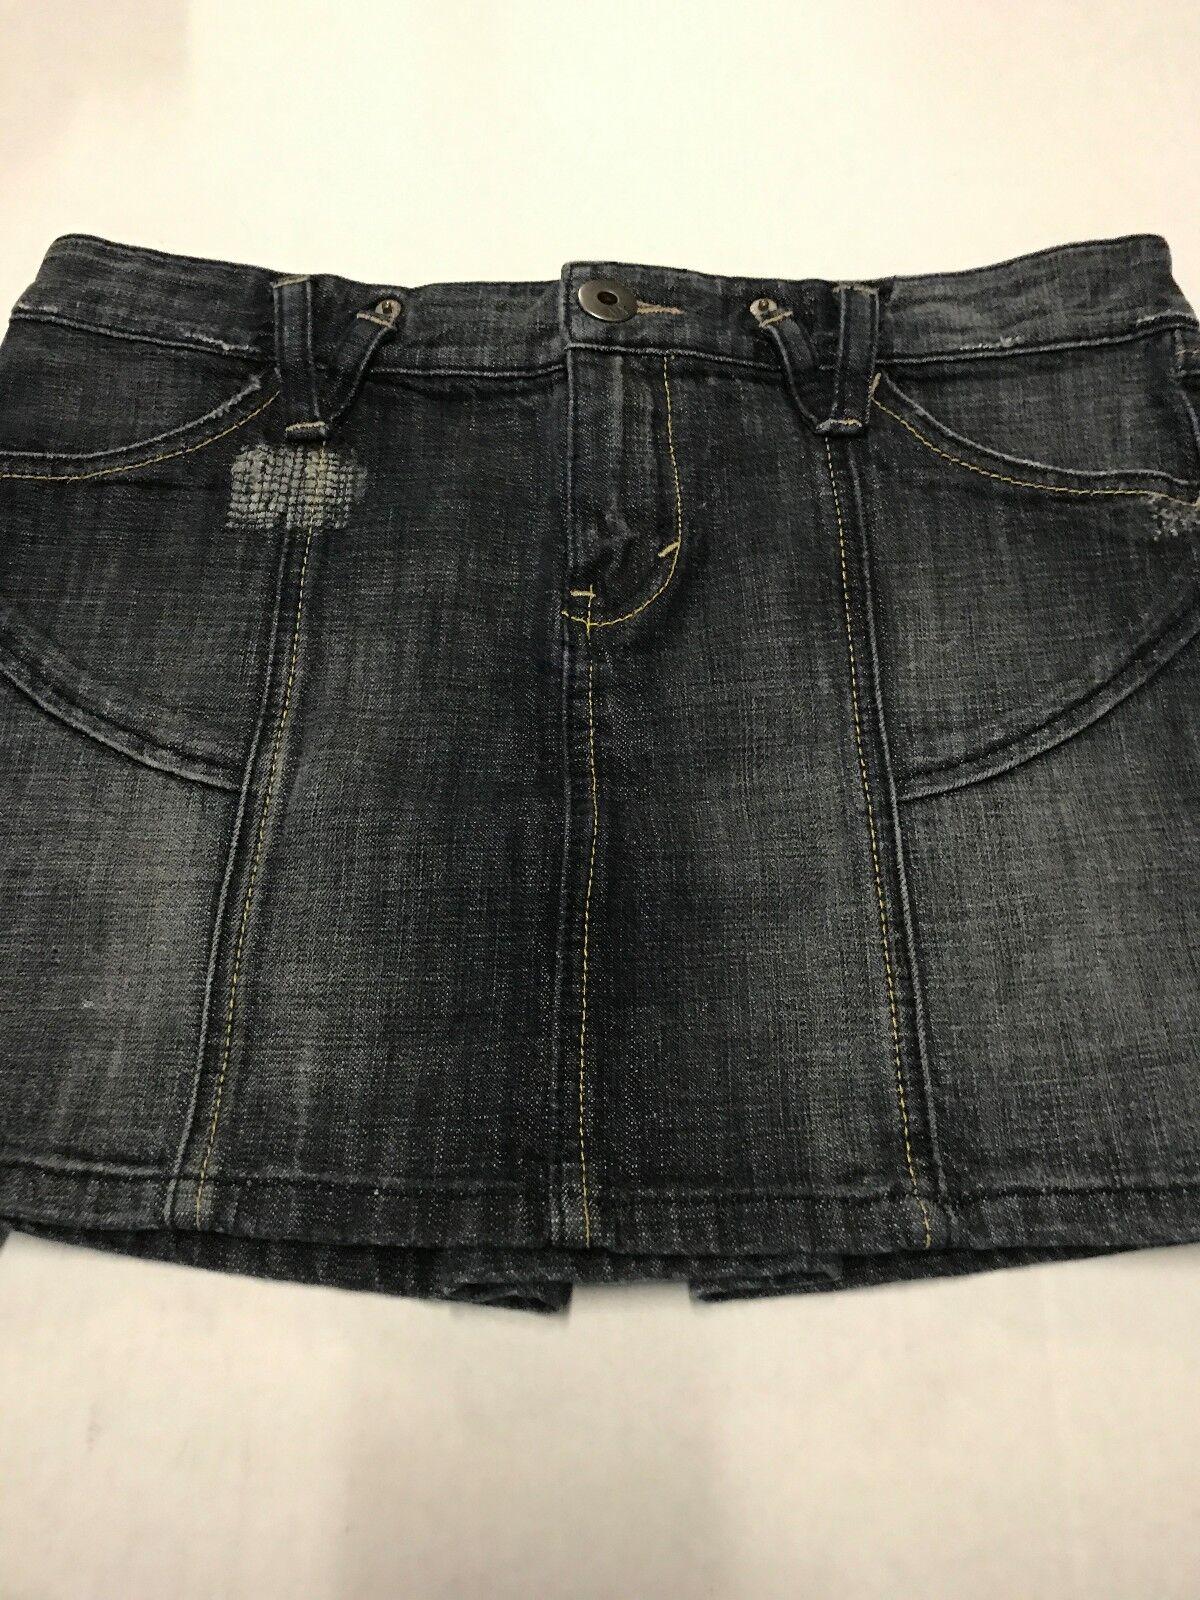 edb36a5956 Armani Exchange Skirt Dark Denim Skirt Size 8 Distressed Women's  nweibe20-Skirts